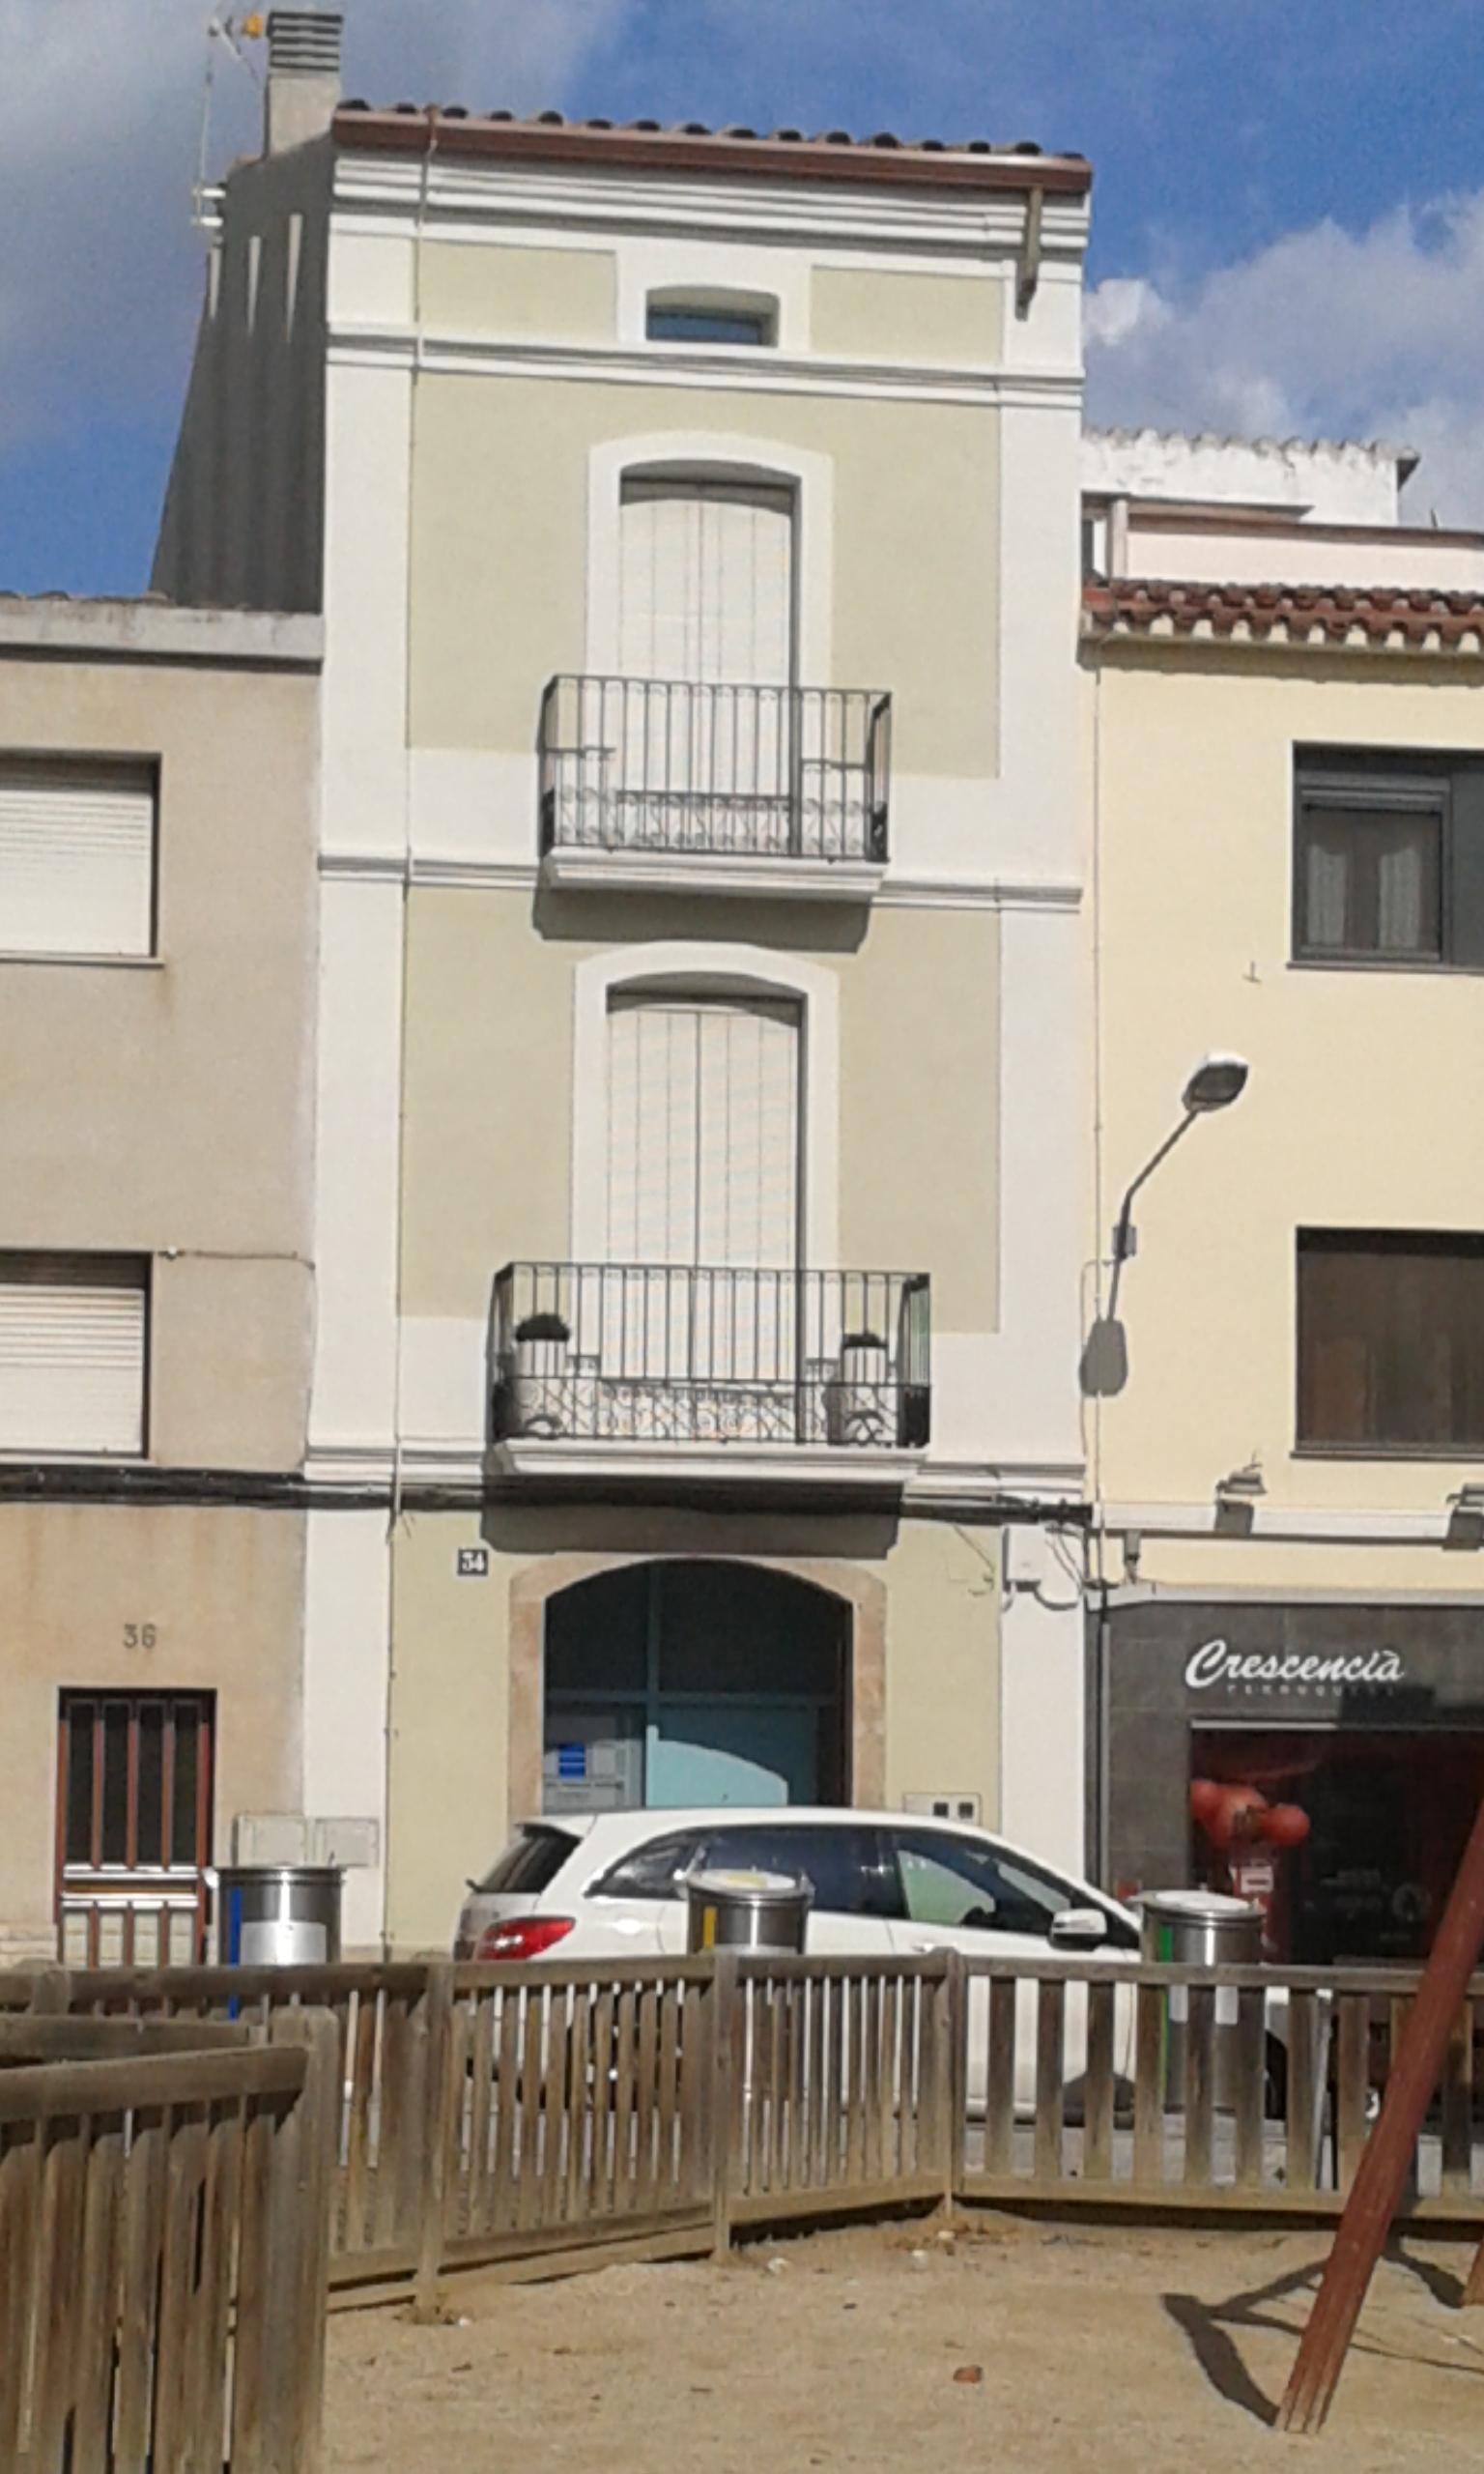 Vivienda unifamiliar fachada – Esparreguera